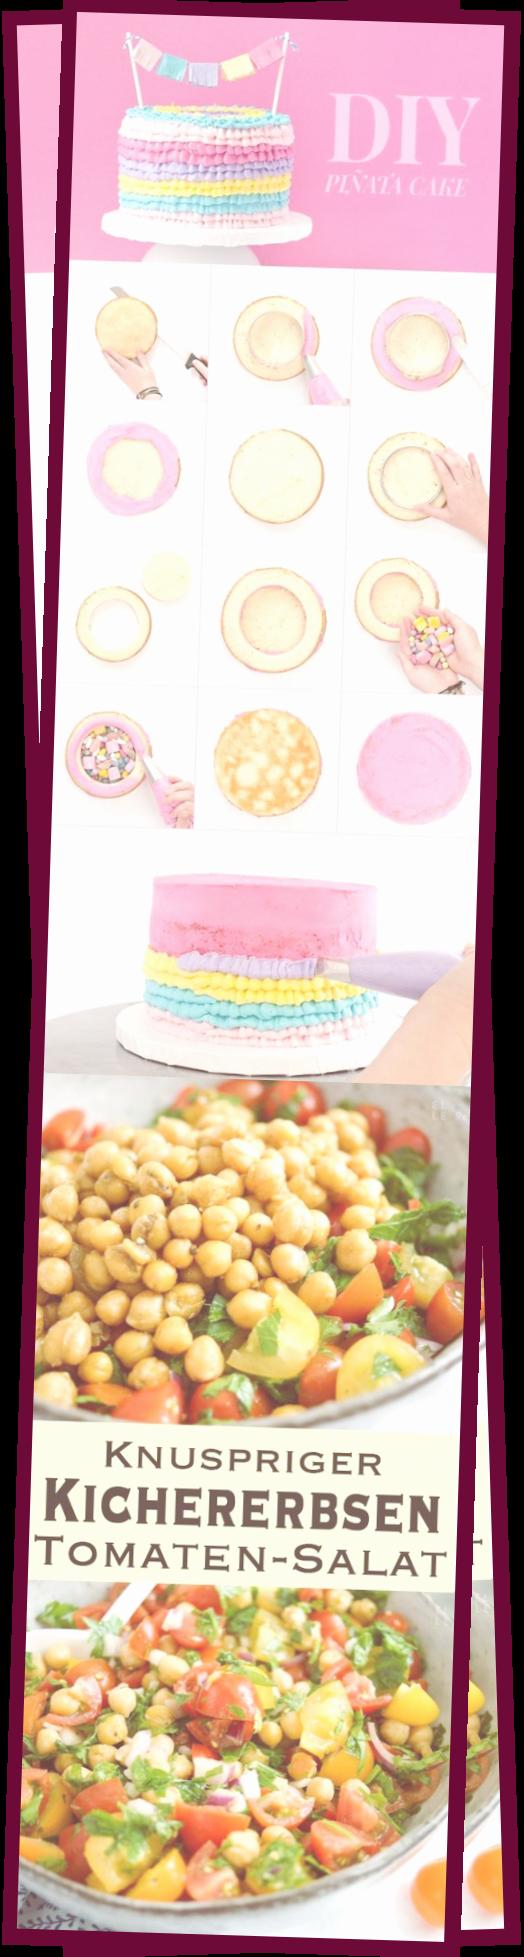 Photo of DIY Piata Kuchen  Diy Cake Pinata  Apfelkuchen  DIY Piata Kuchen Di – Apfel Kuchen